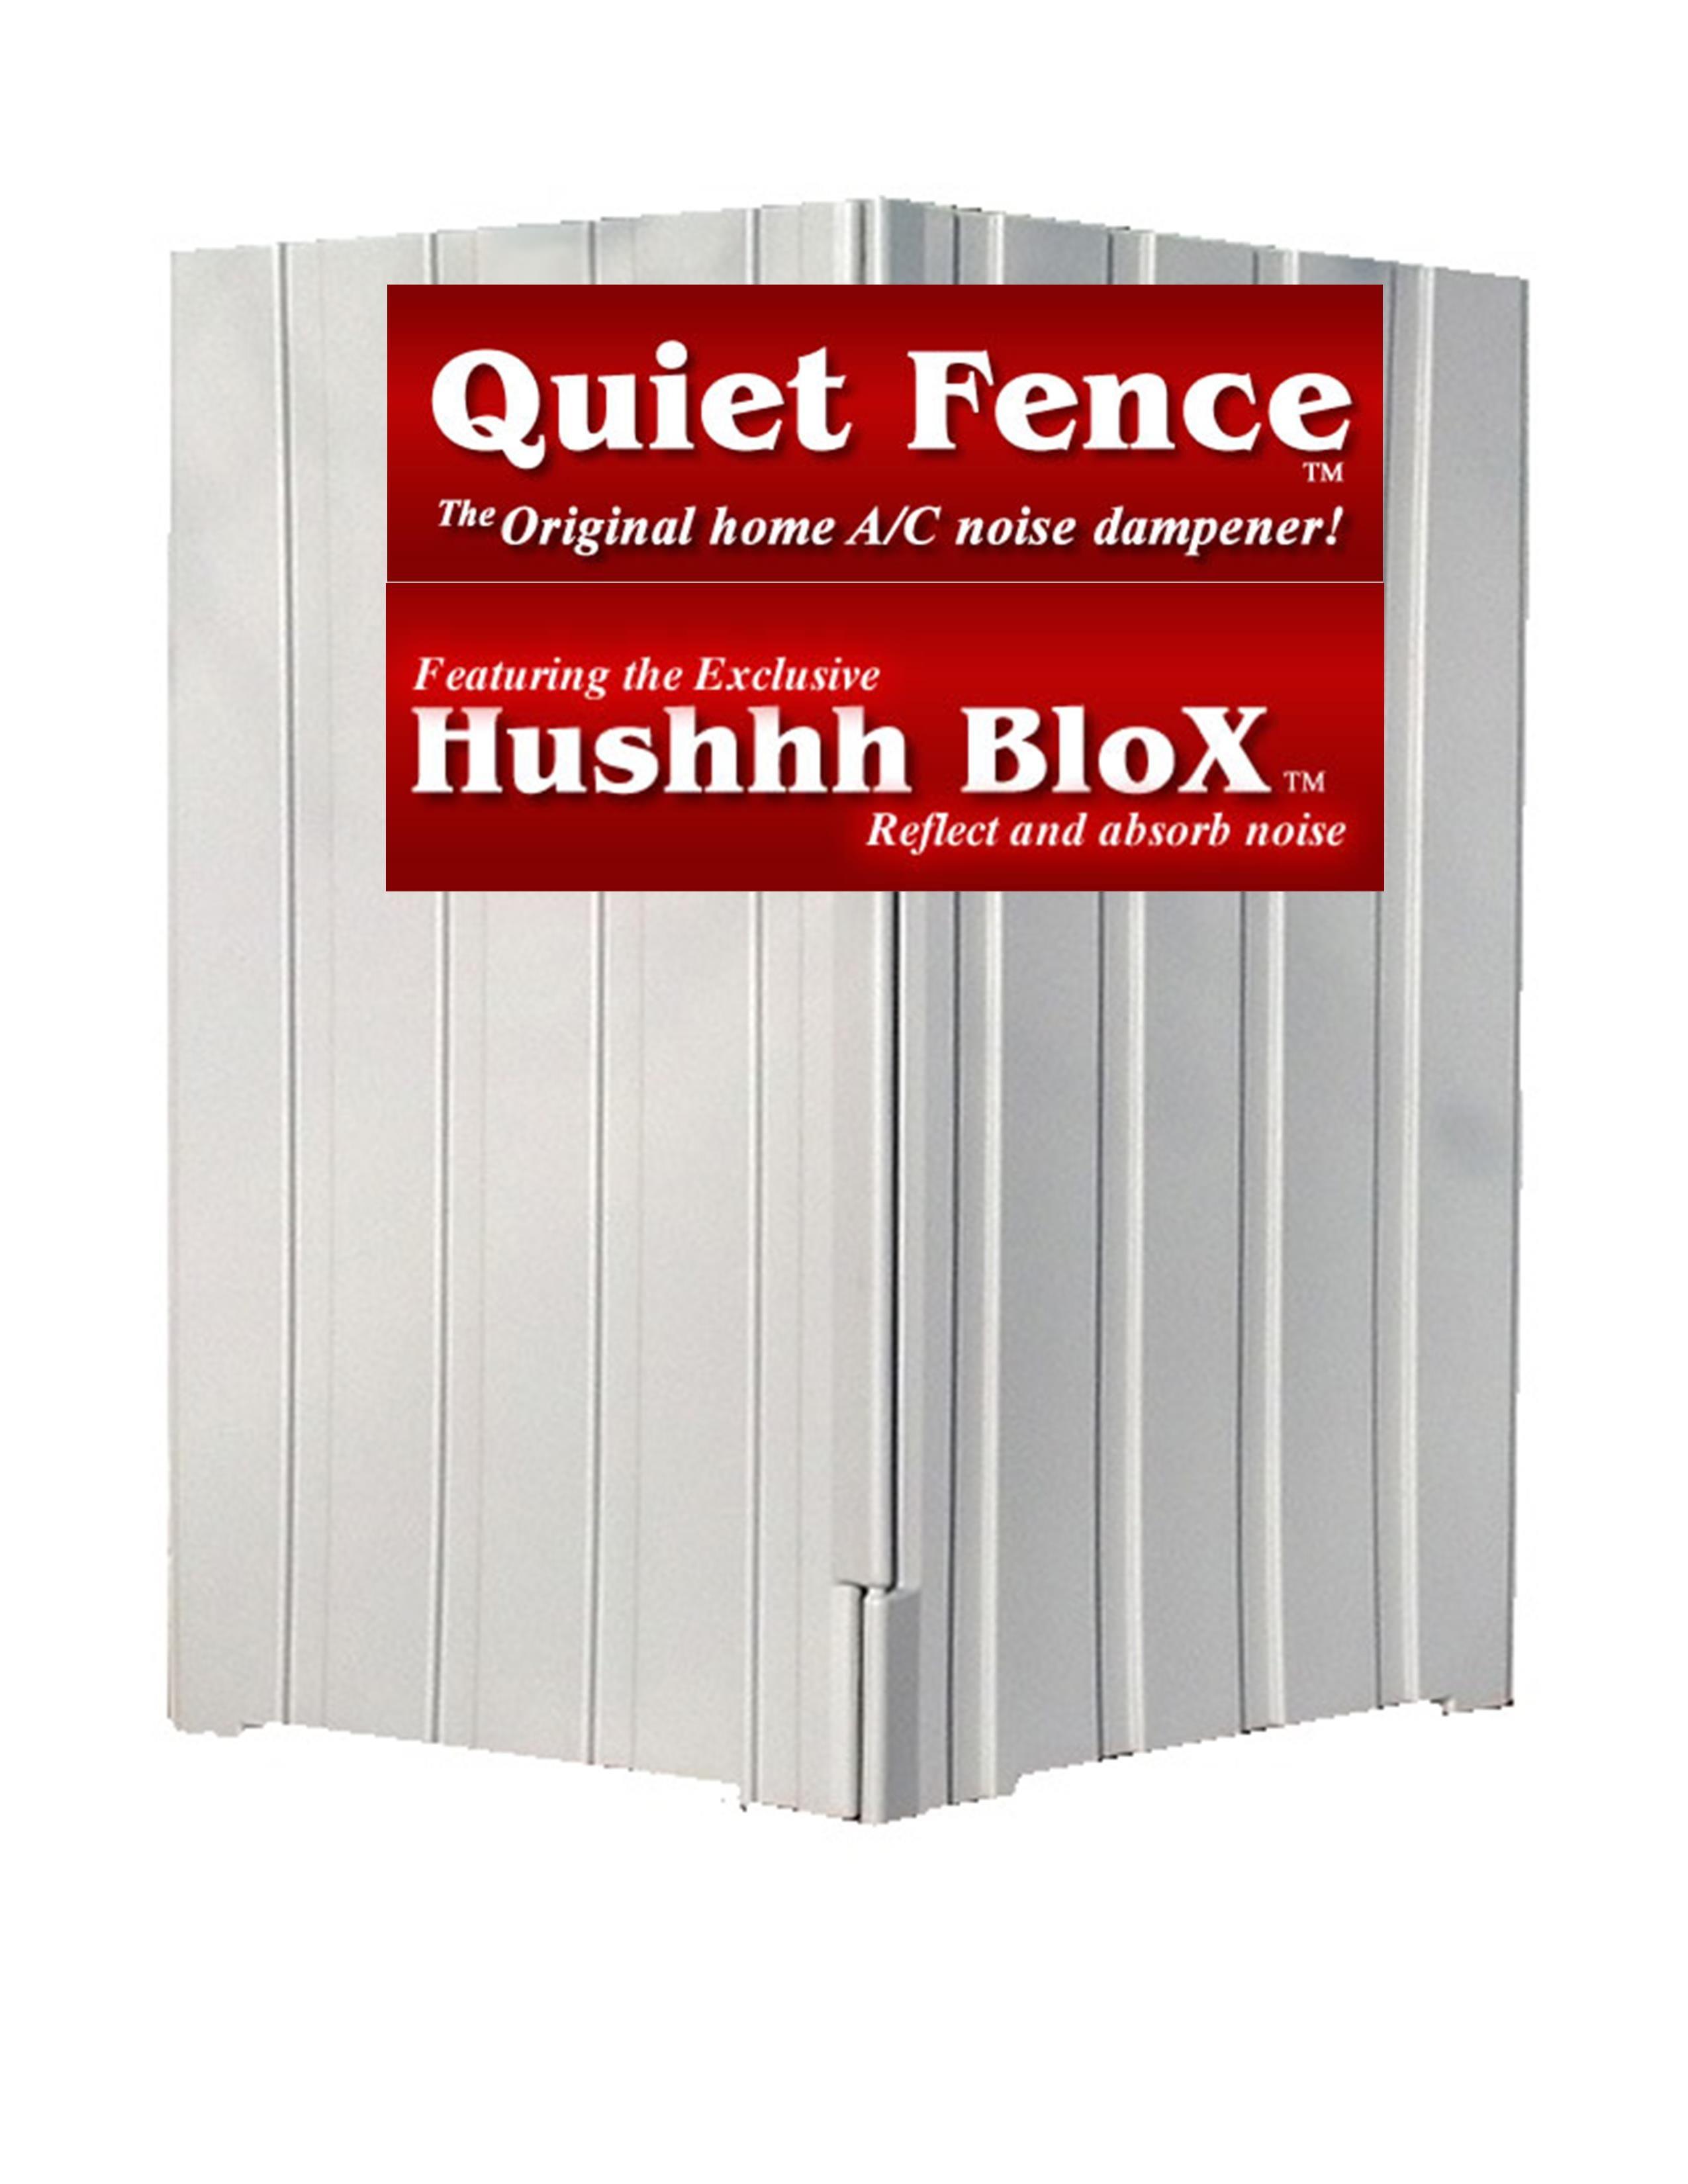 A/C / Pool Pump/ Pool Heater noise Dampener! One Quiet